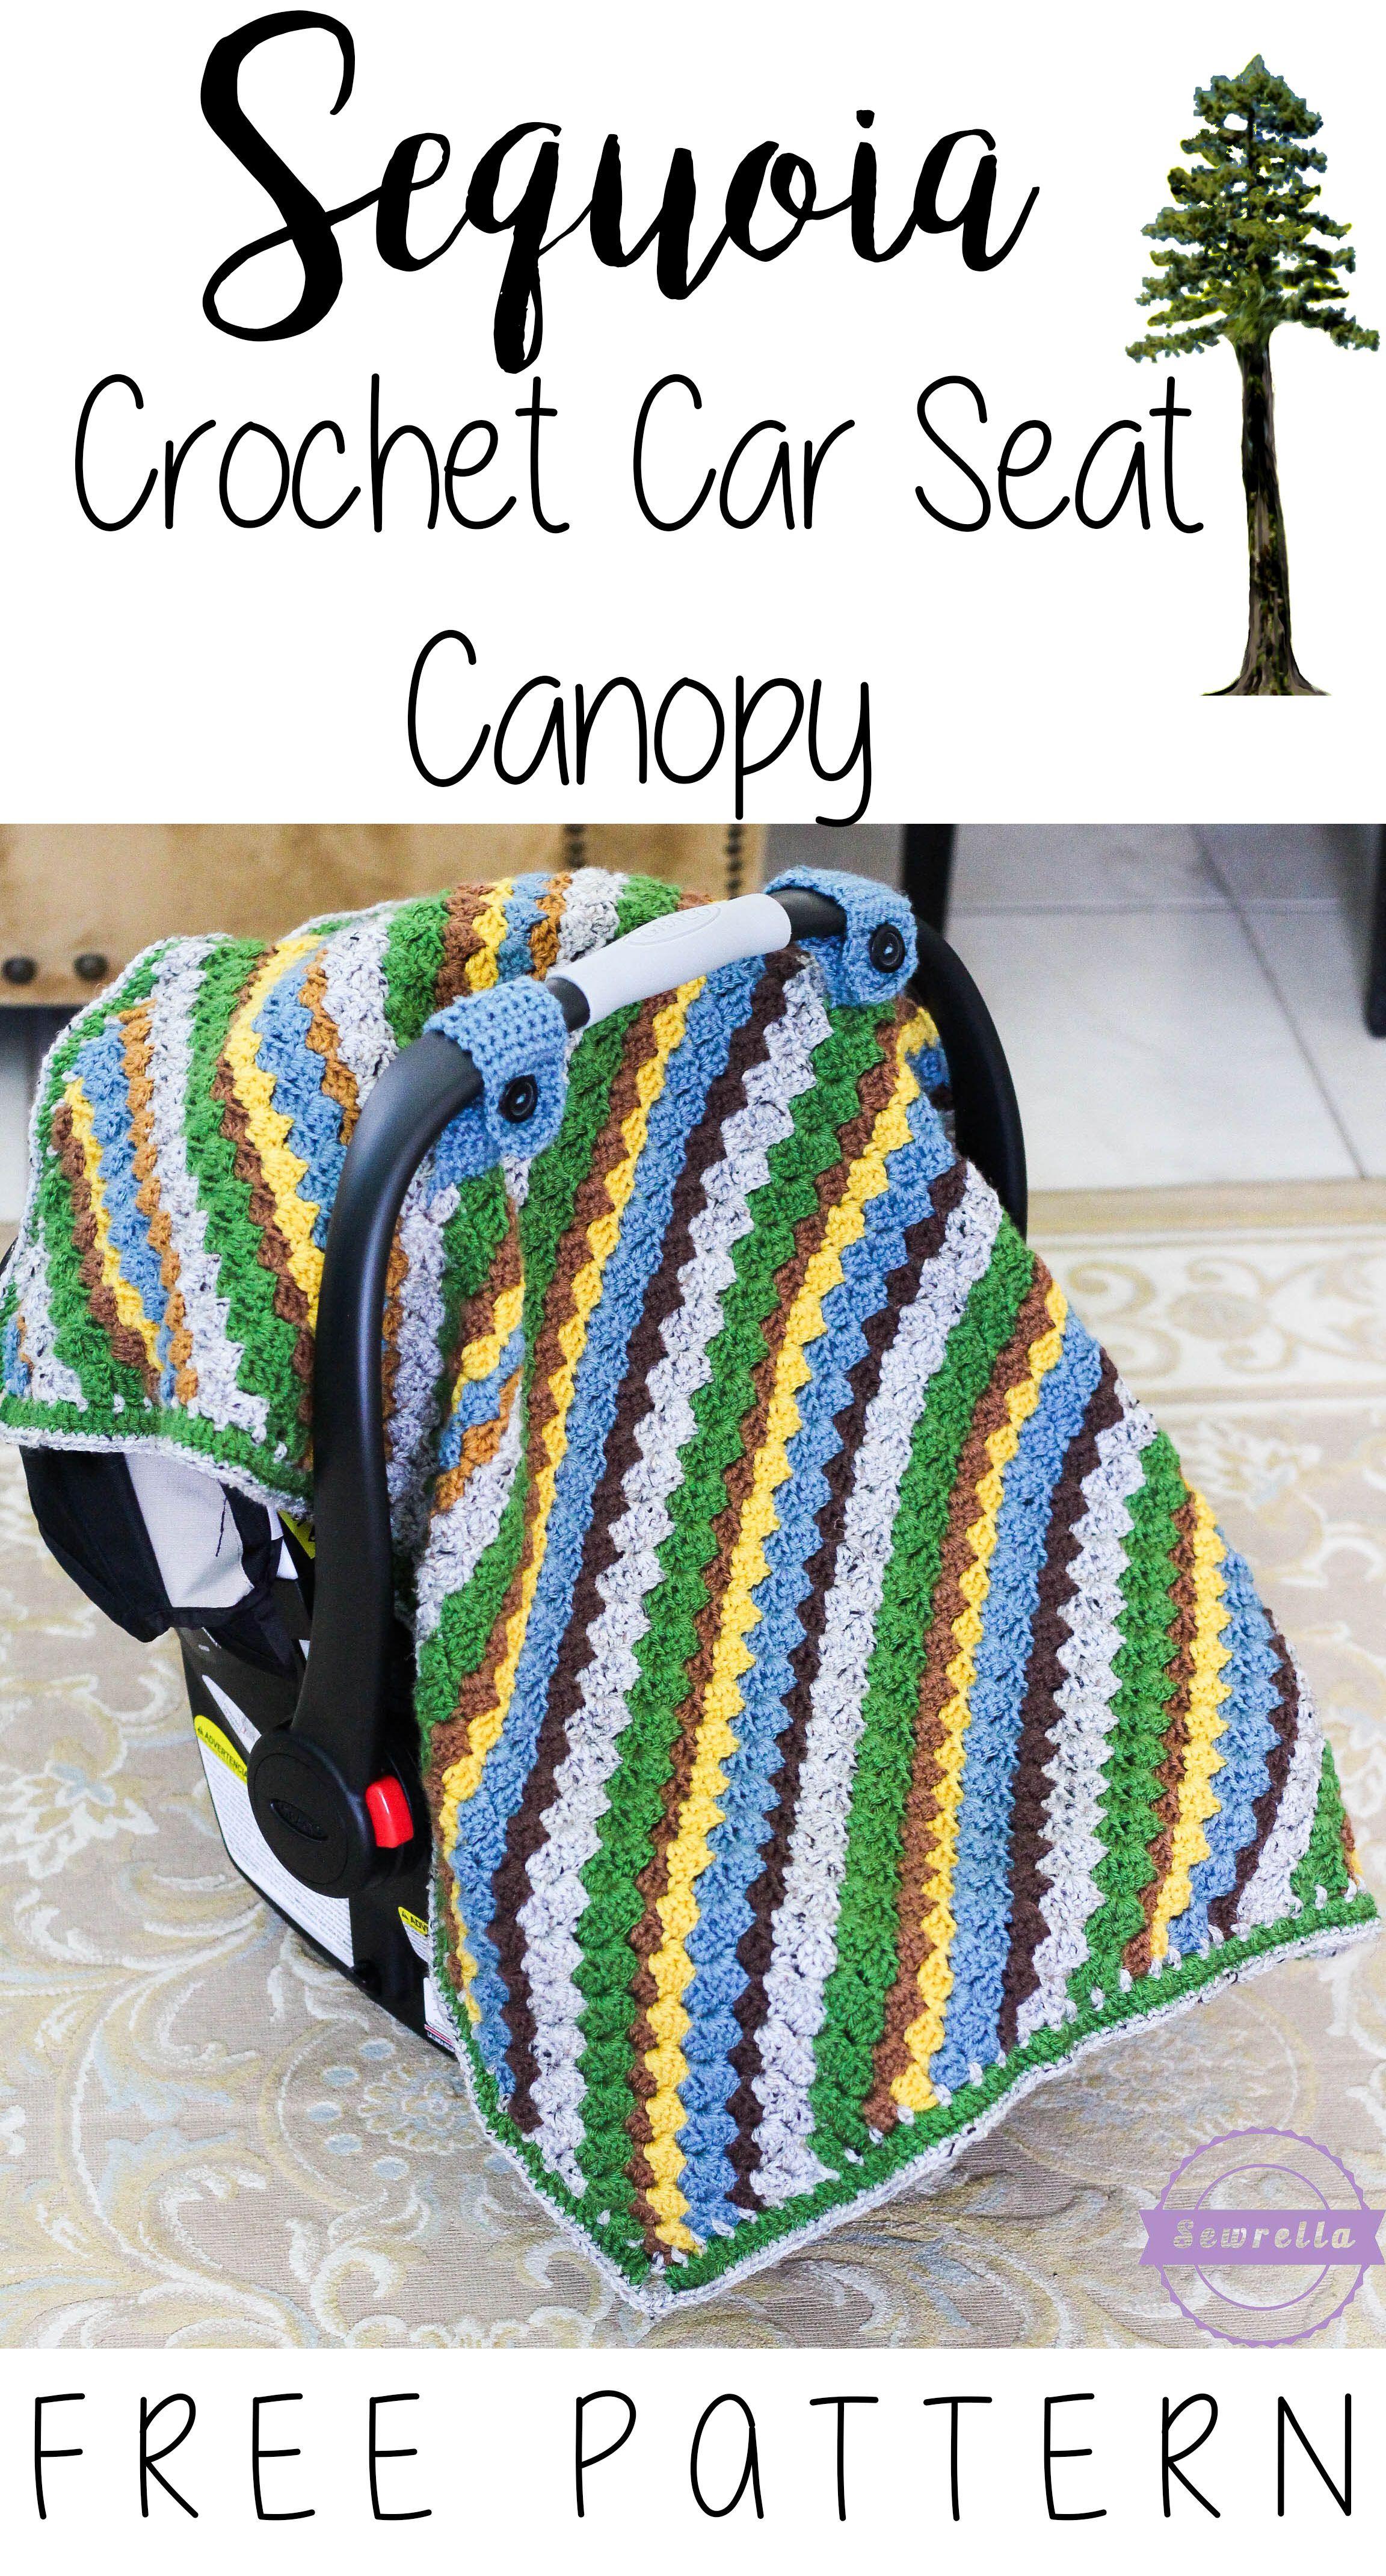 Sequoia crochet car seat canopy crochet car car seat canopy and blanket sequoia crochet car seat canopy by ashleigh free crochet pattern bankloansurffo Images